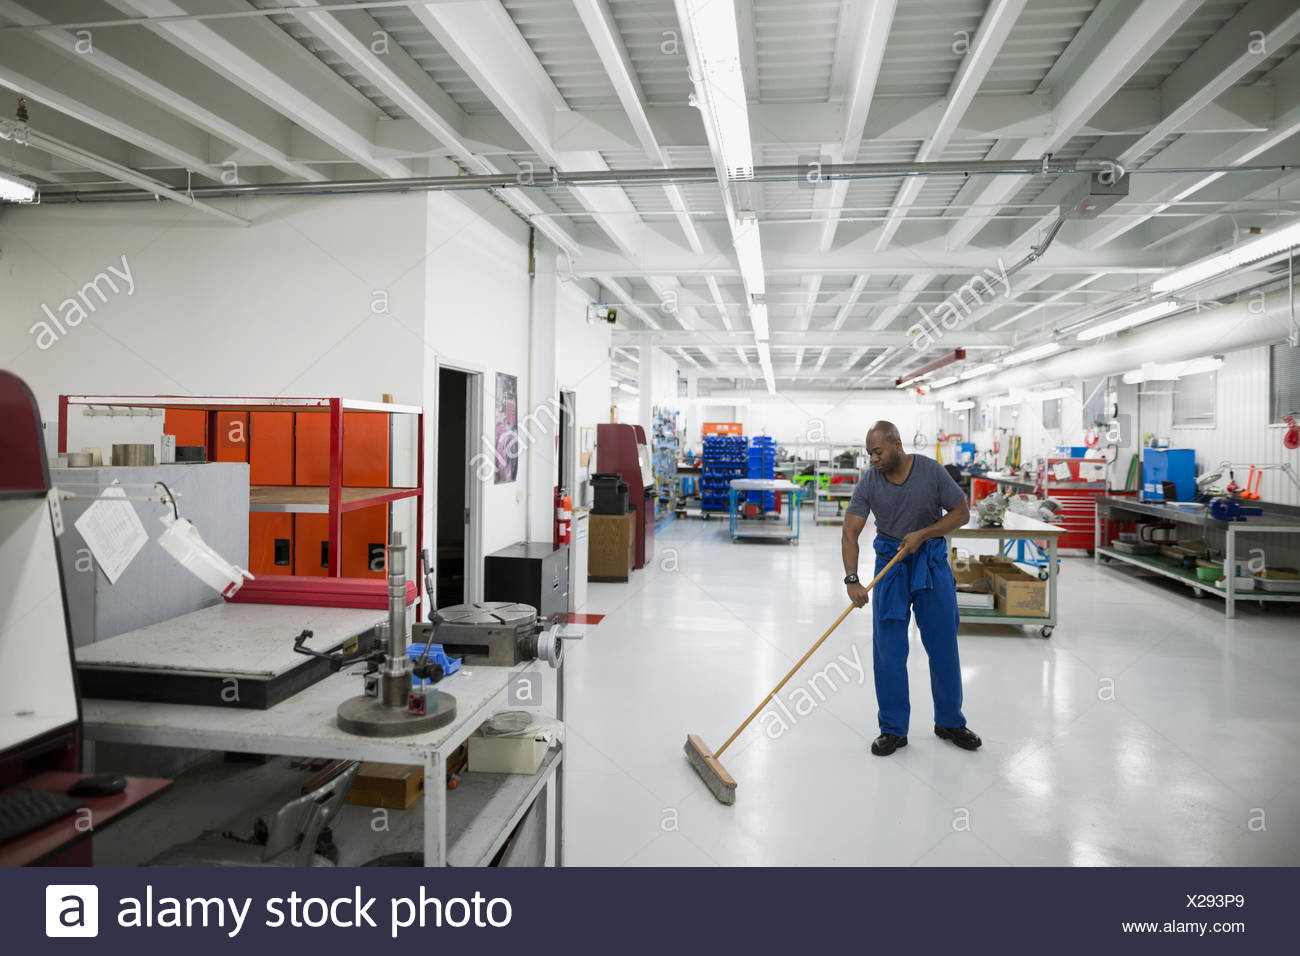 Helicopter mechanic sweeping workshop floor - Stock Image